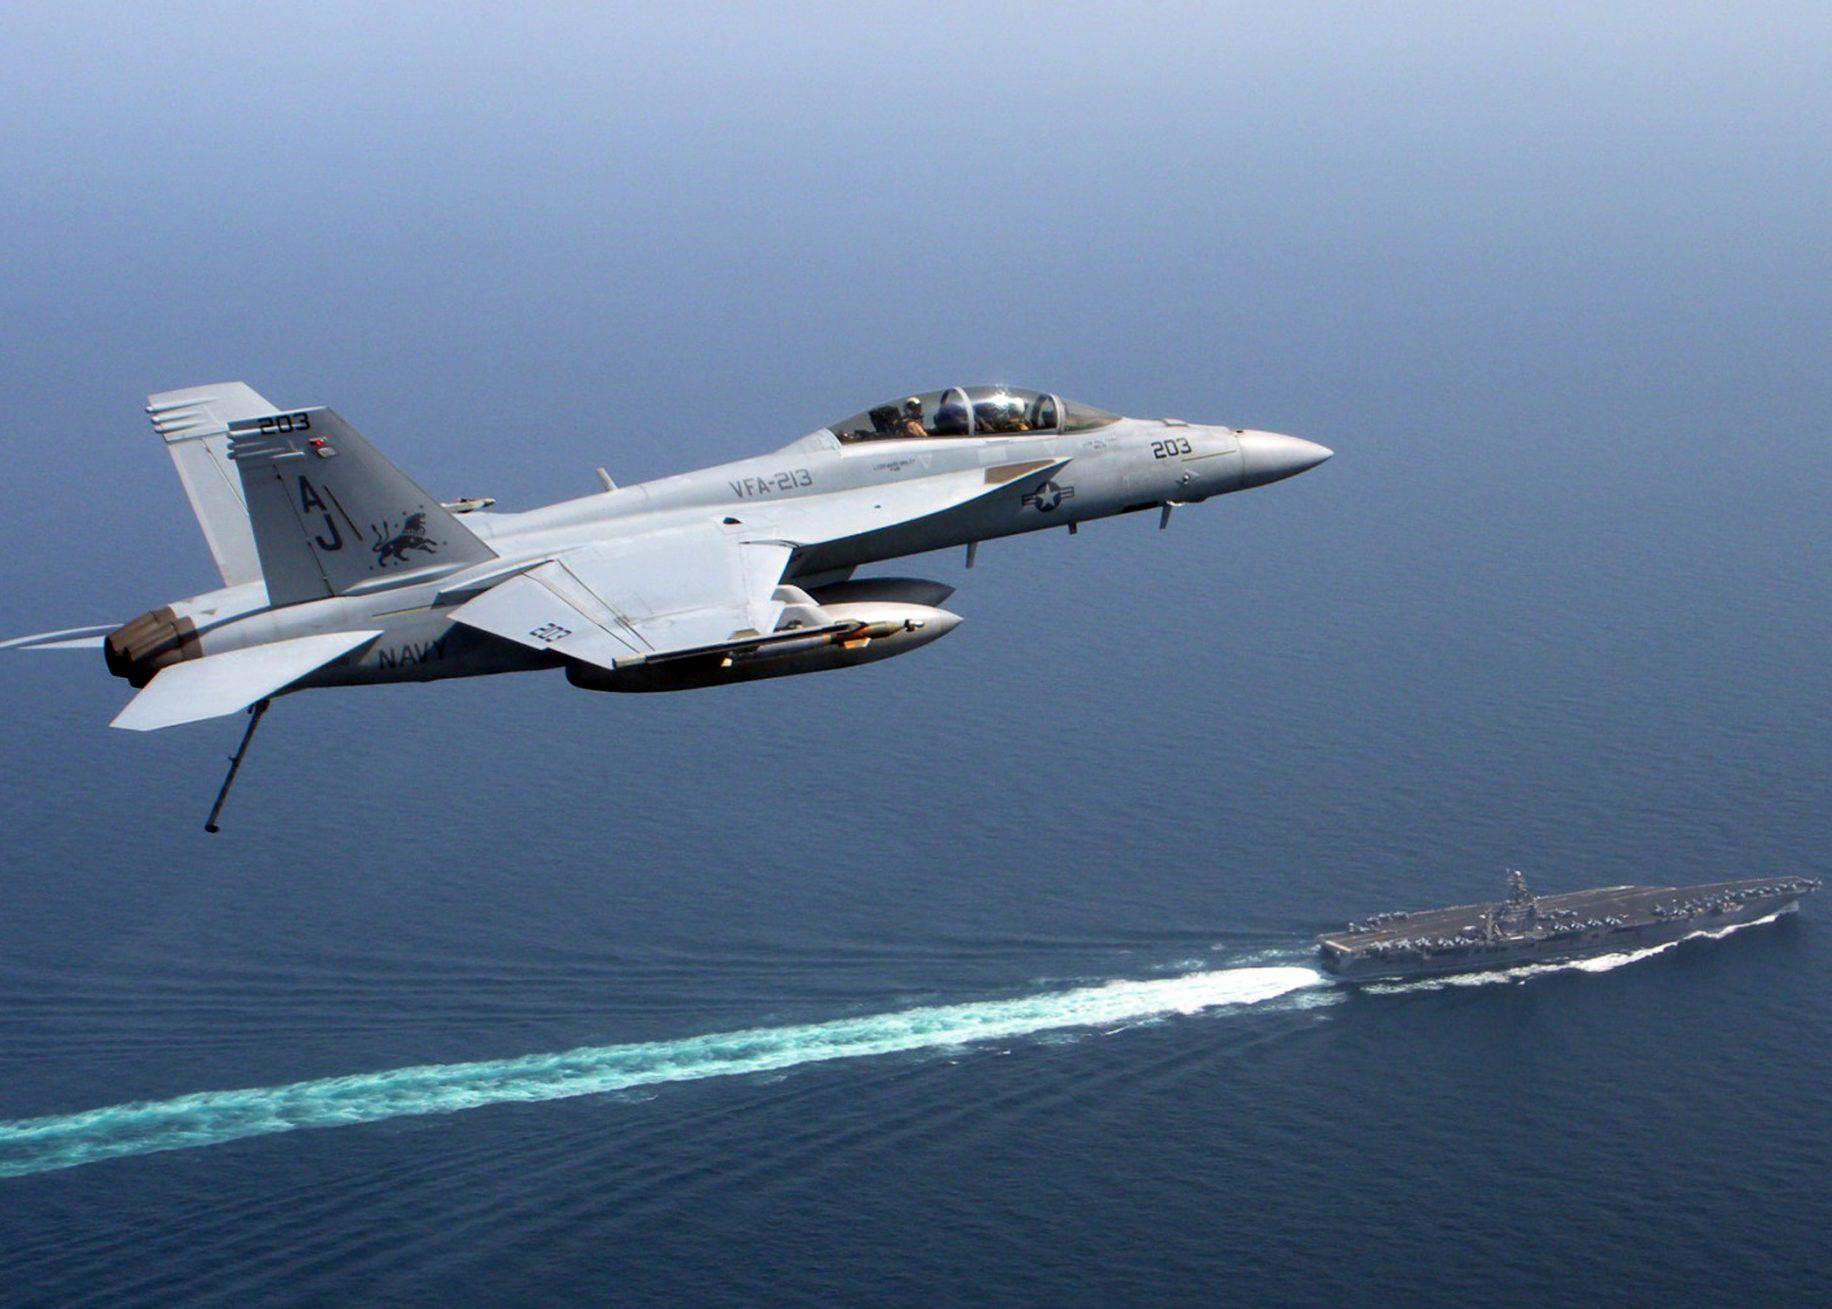 https://americanmilitarynews.com/wp-content/uploads/F-A_18_Super_Hornet_over_USS_Theodore_Roosevelt_CVN_71.jpg